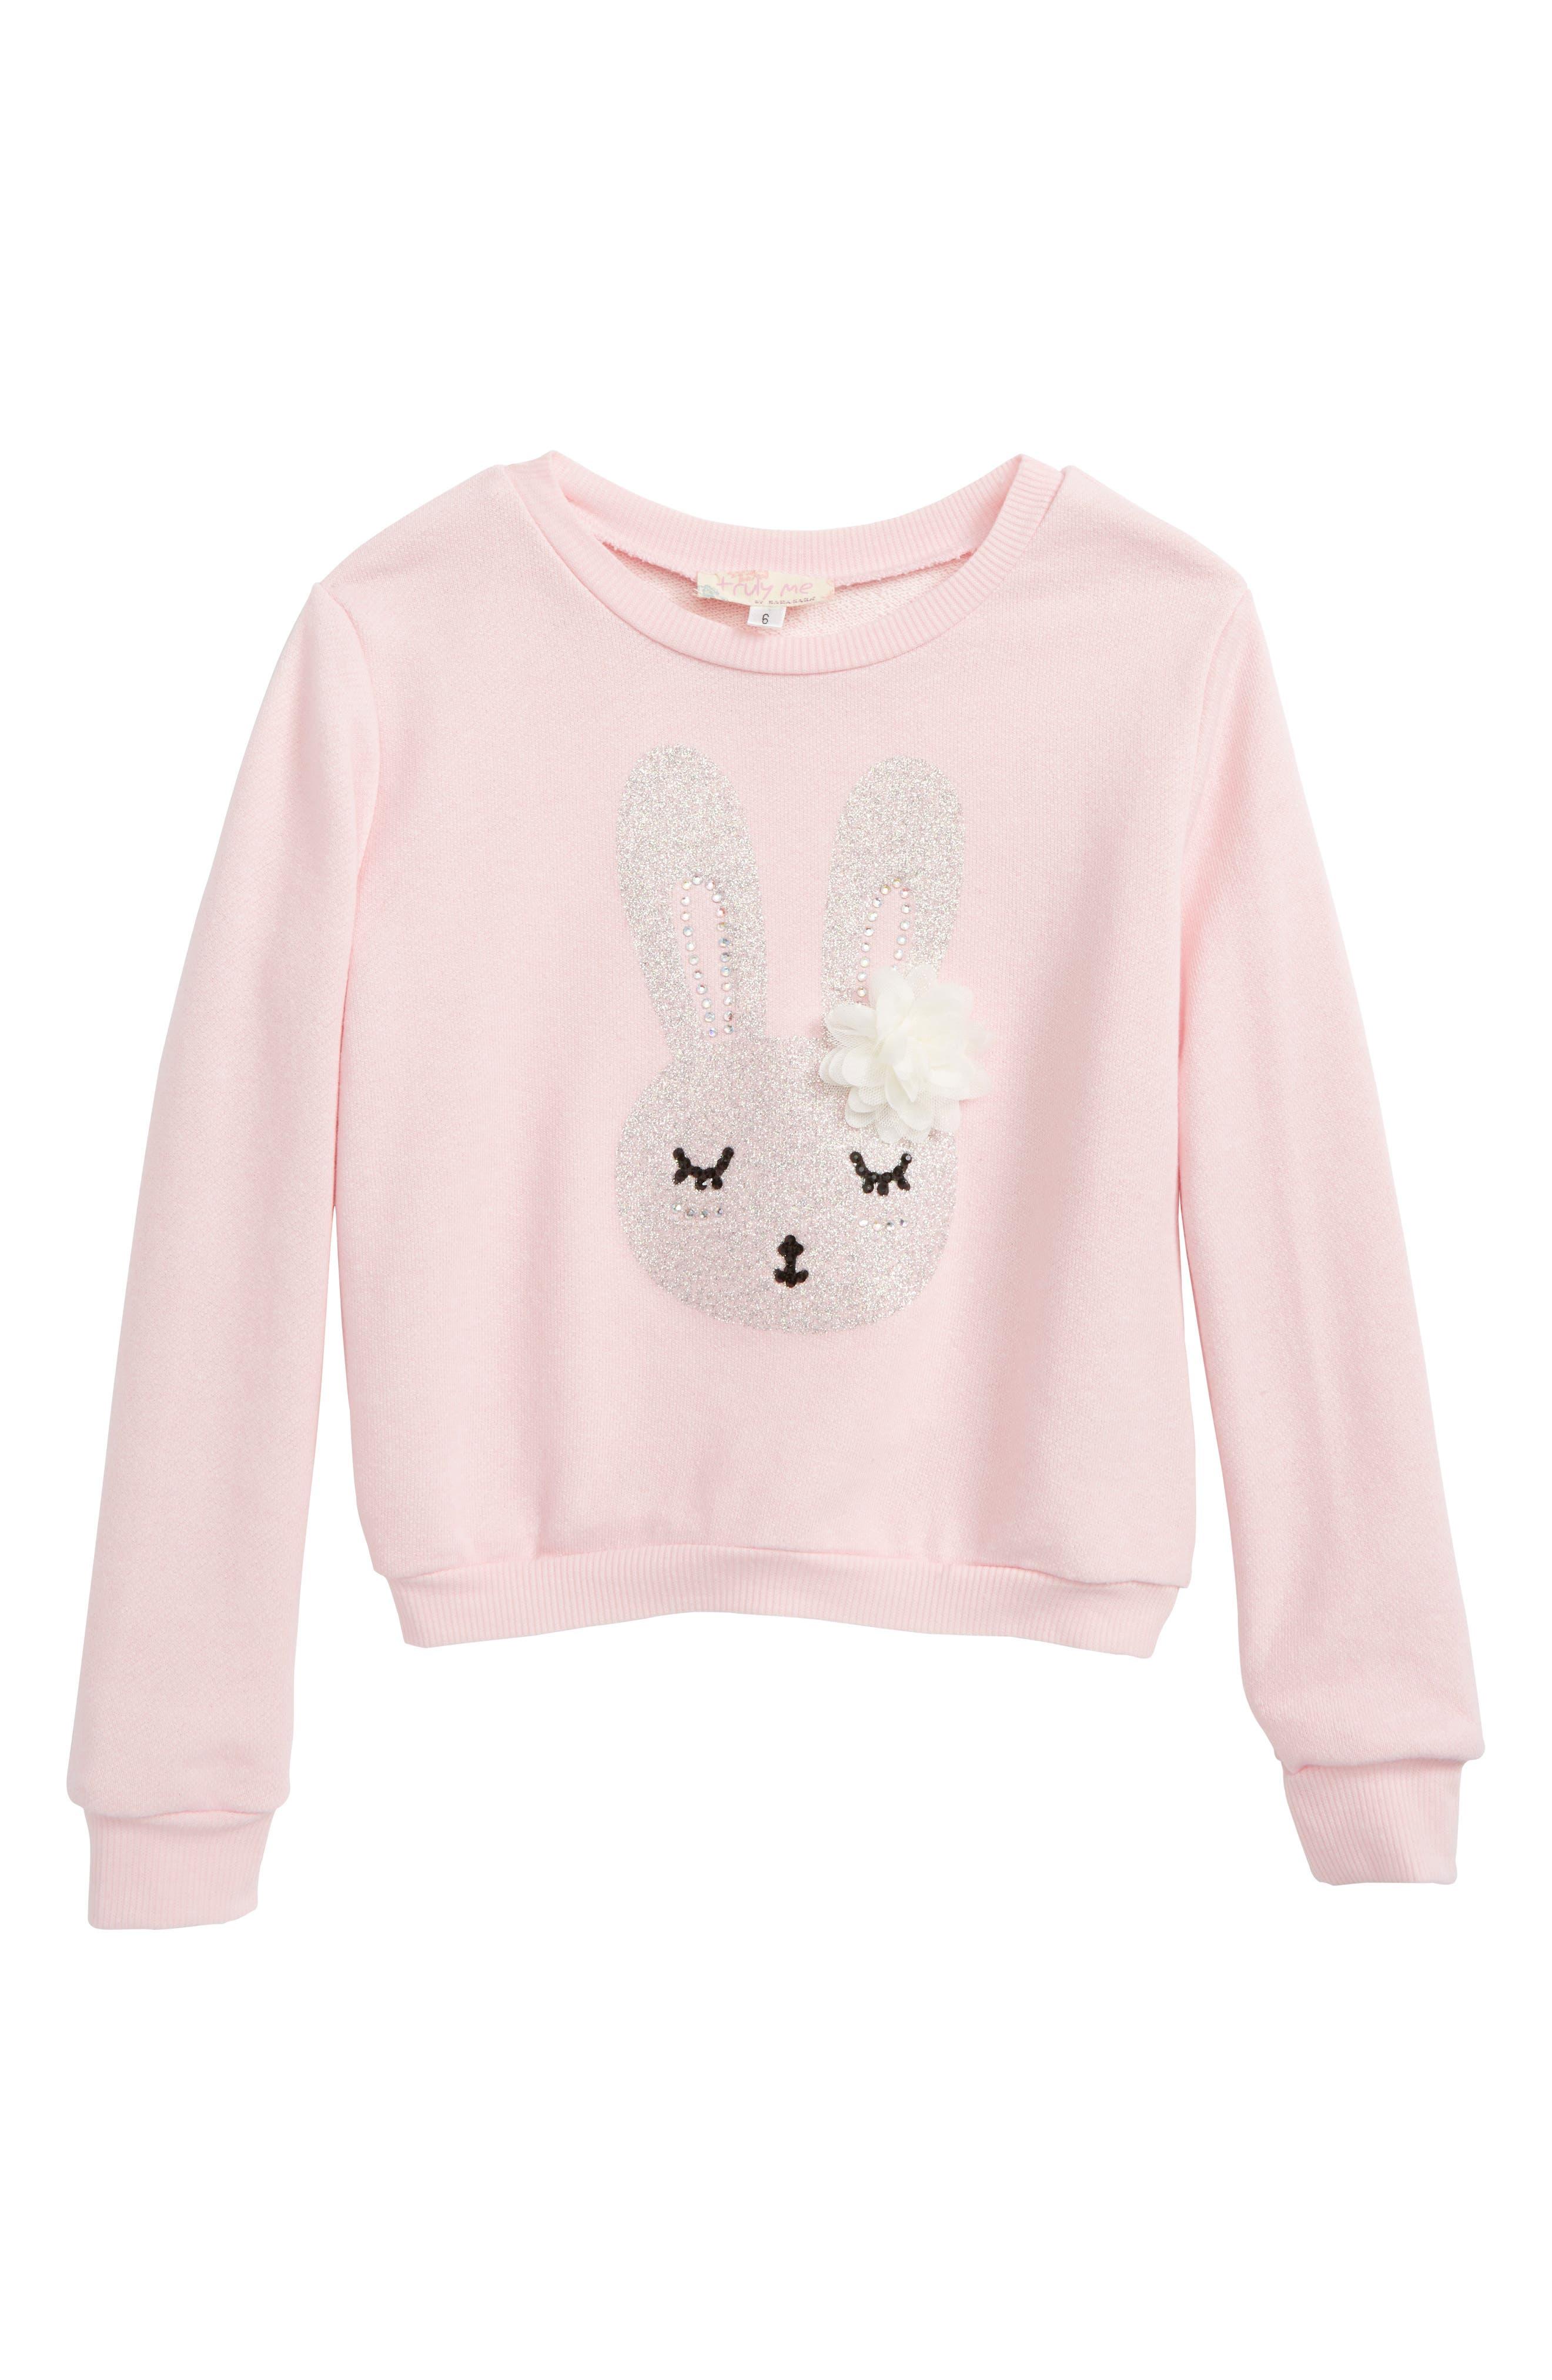 Bunny Graphic Sweatshirt,                         Main,                         color, Pink